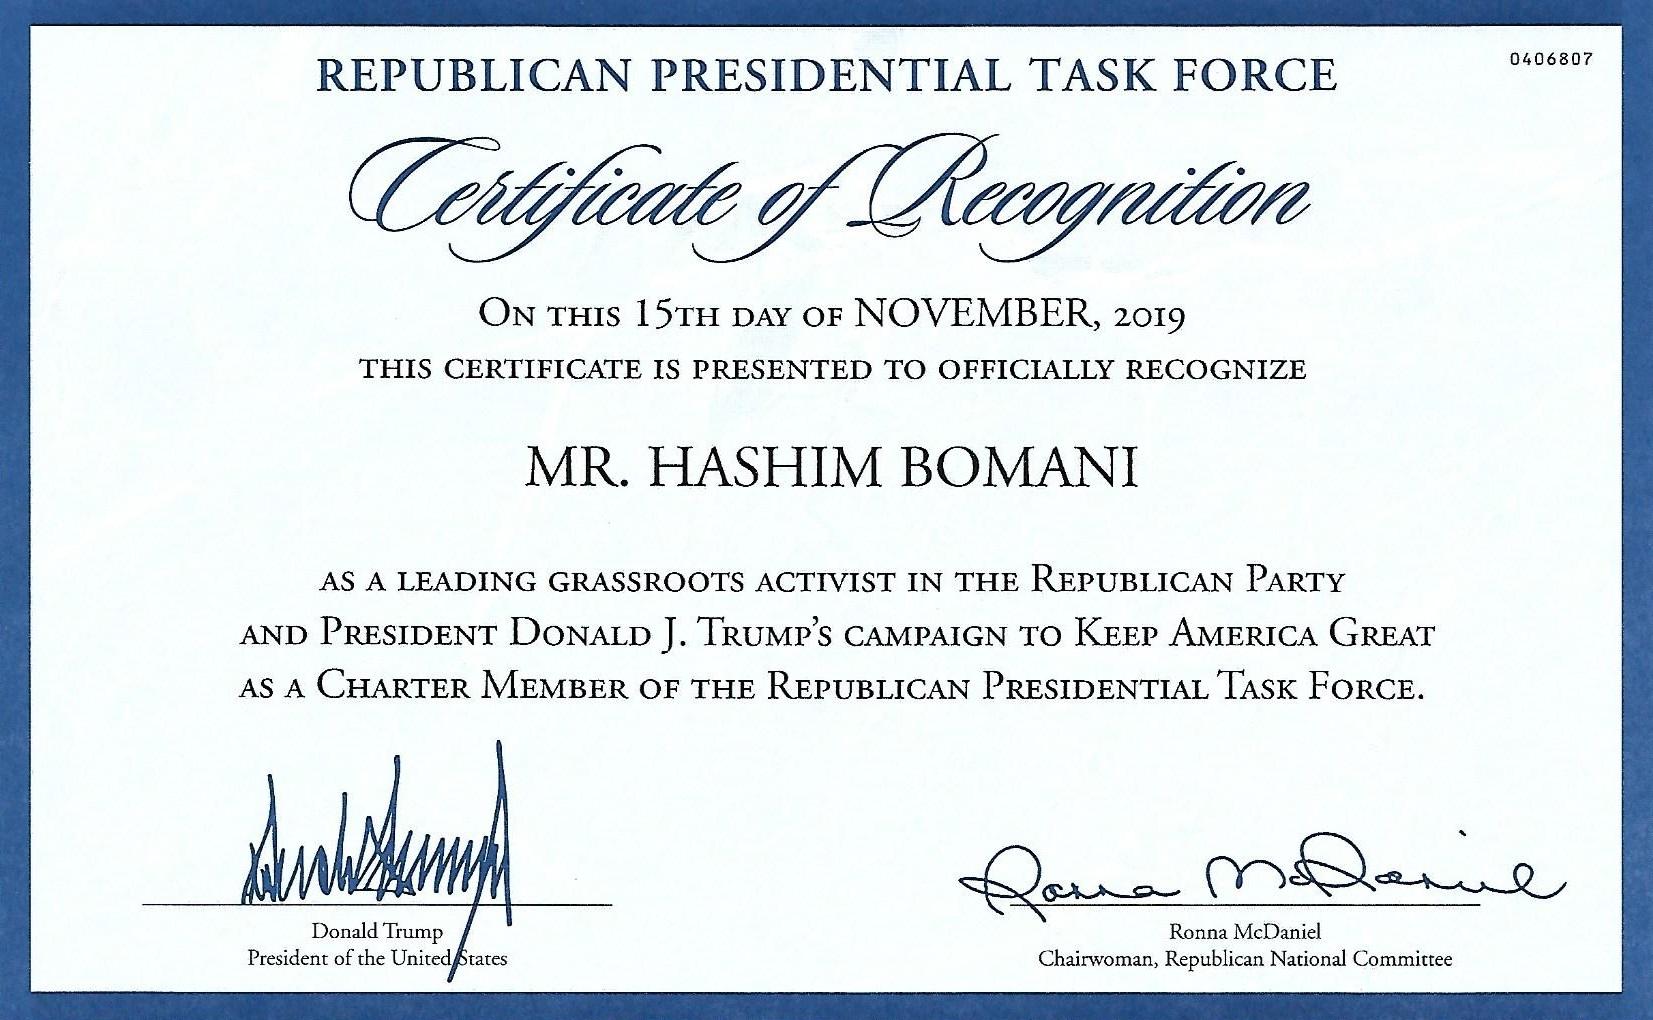 REPUBLICAN TASK FORCE AWARD